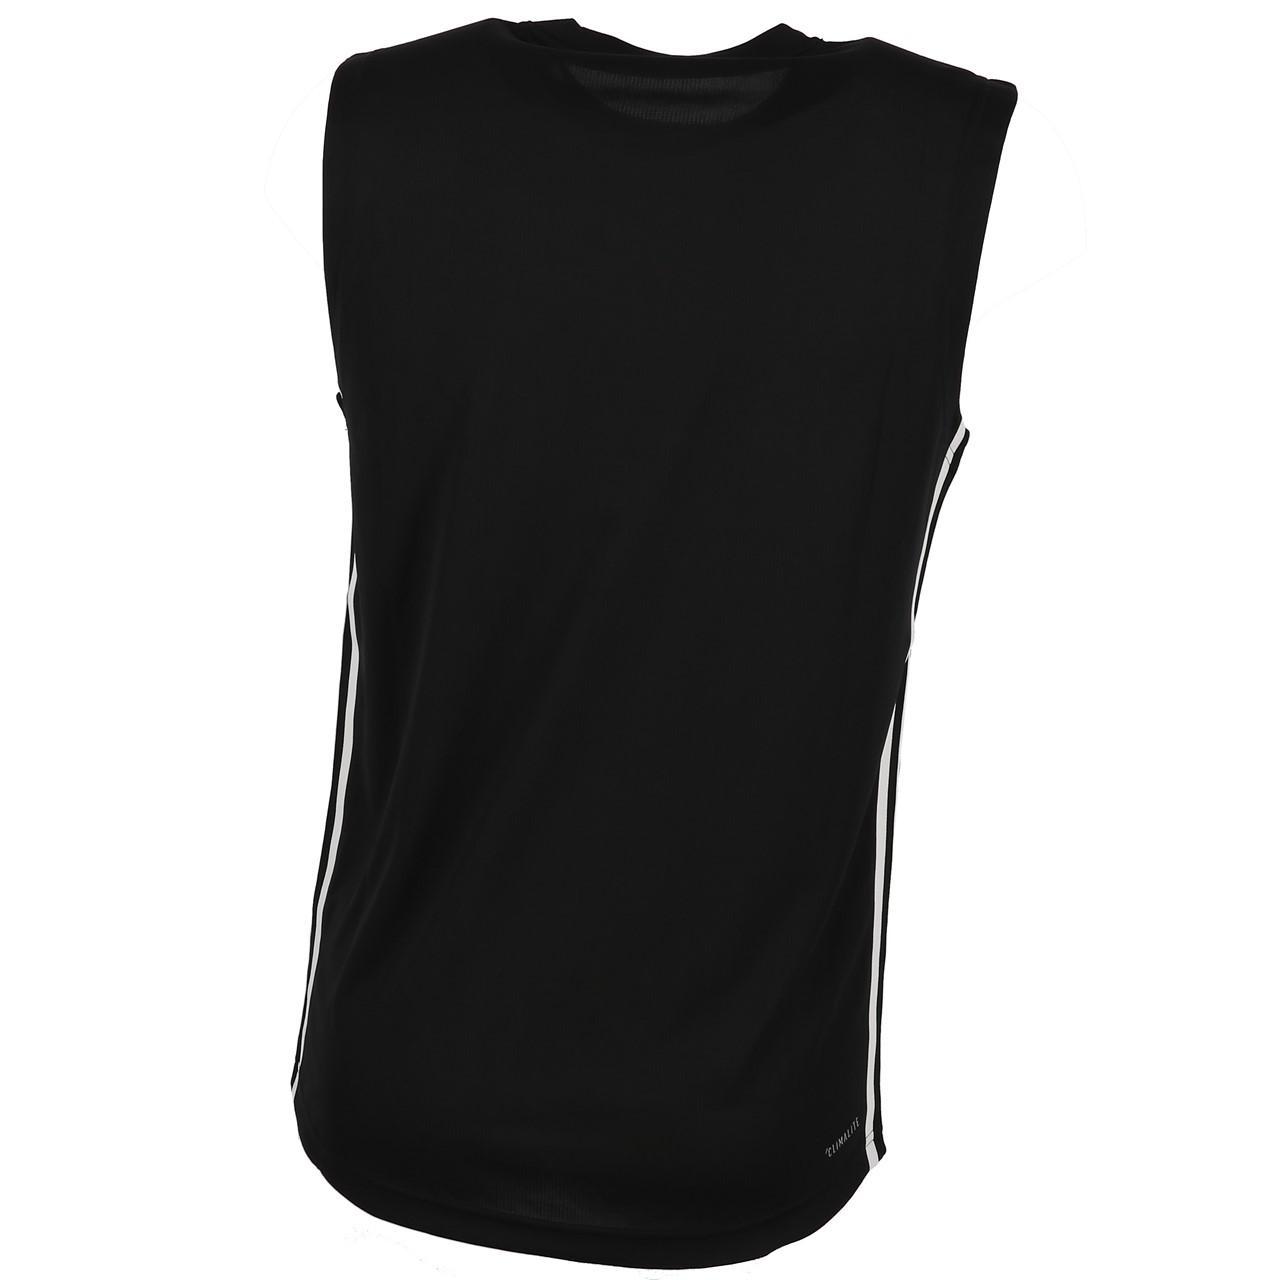 Sleeveless-Shirt-Adidas-D2m-Sl-3s-Blk-Sm-Tee-Black-90912-New thumbnail 5